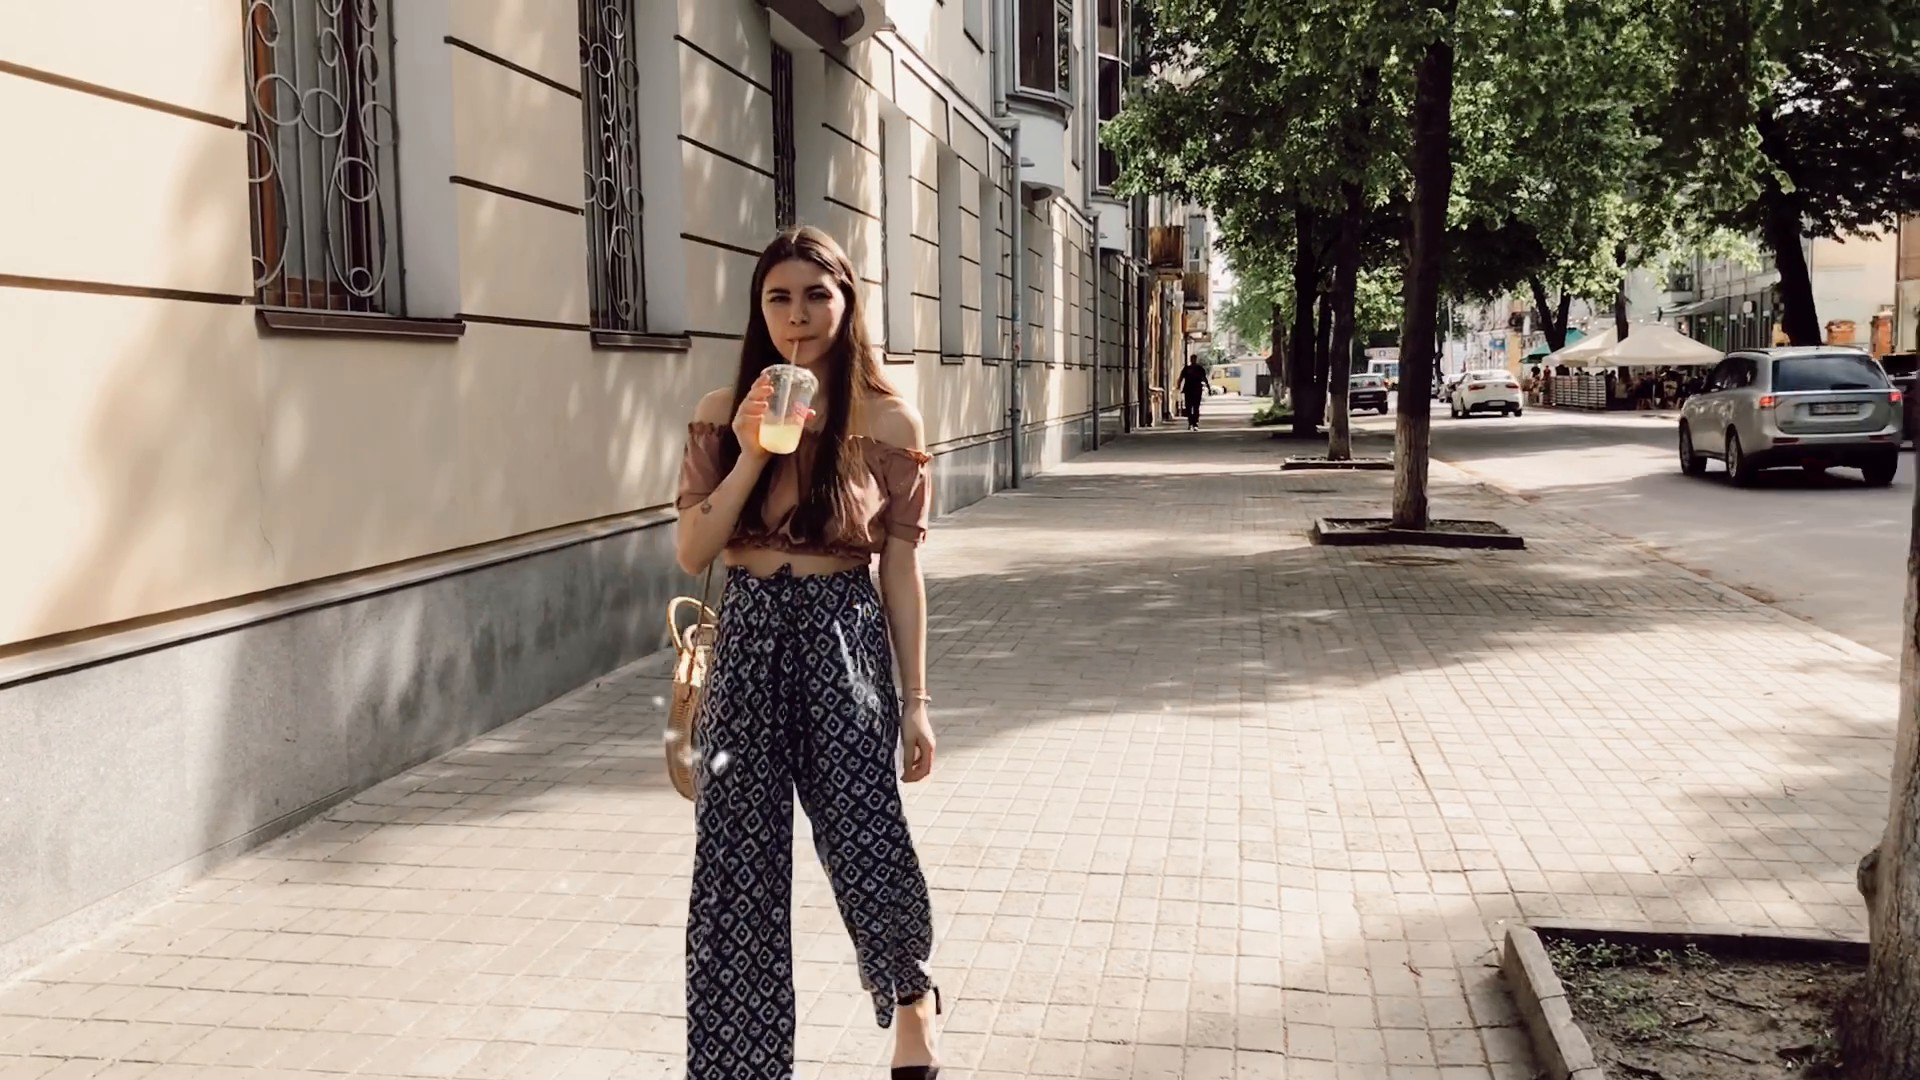 Mila Poltava 18 y.o. - intelligent lady - small public photo.